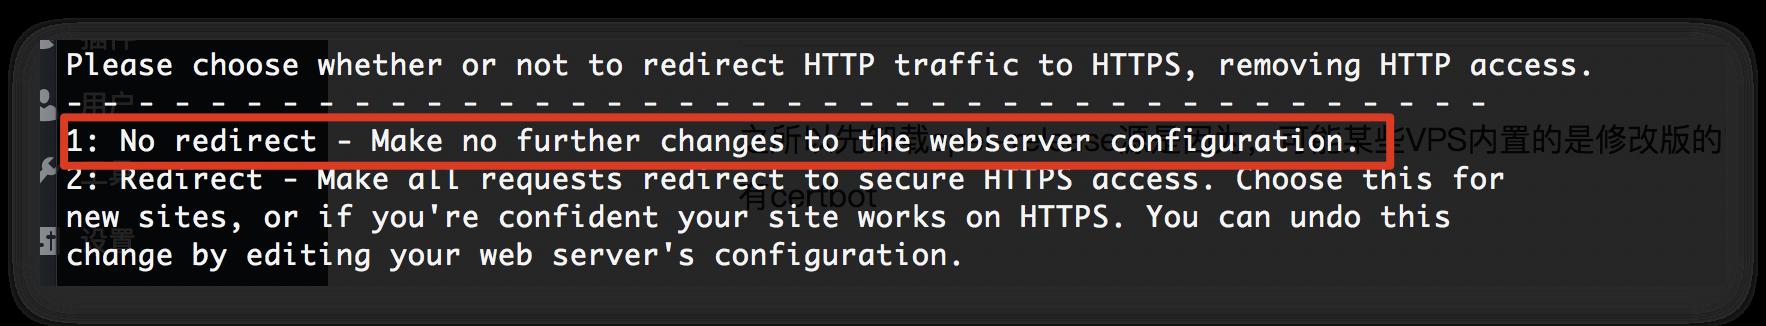 《Nginx反向代理https,配置lets-encrypt证书教程》